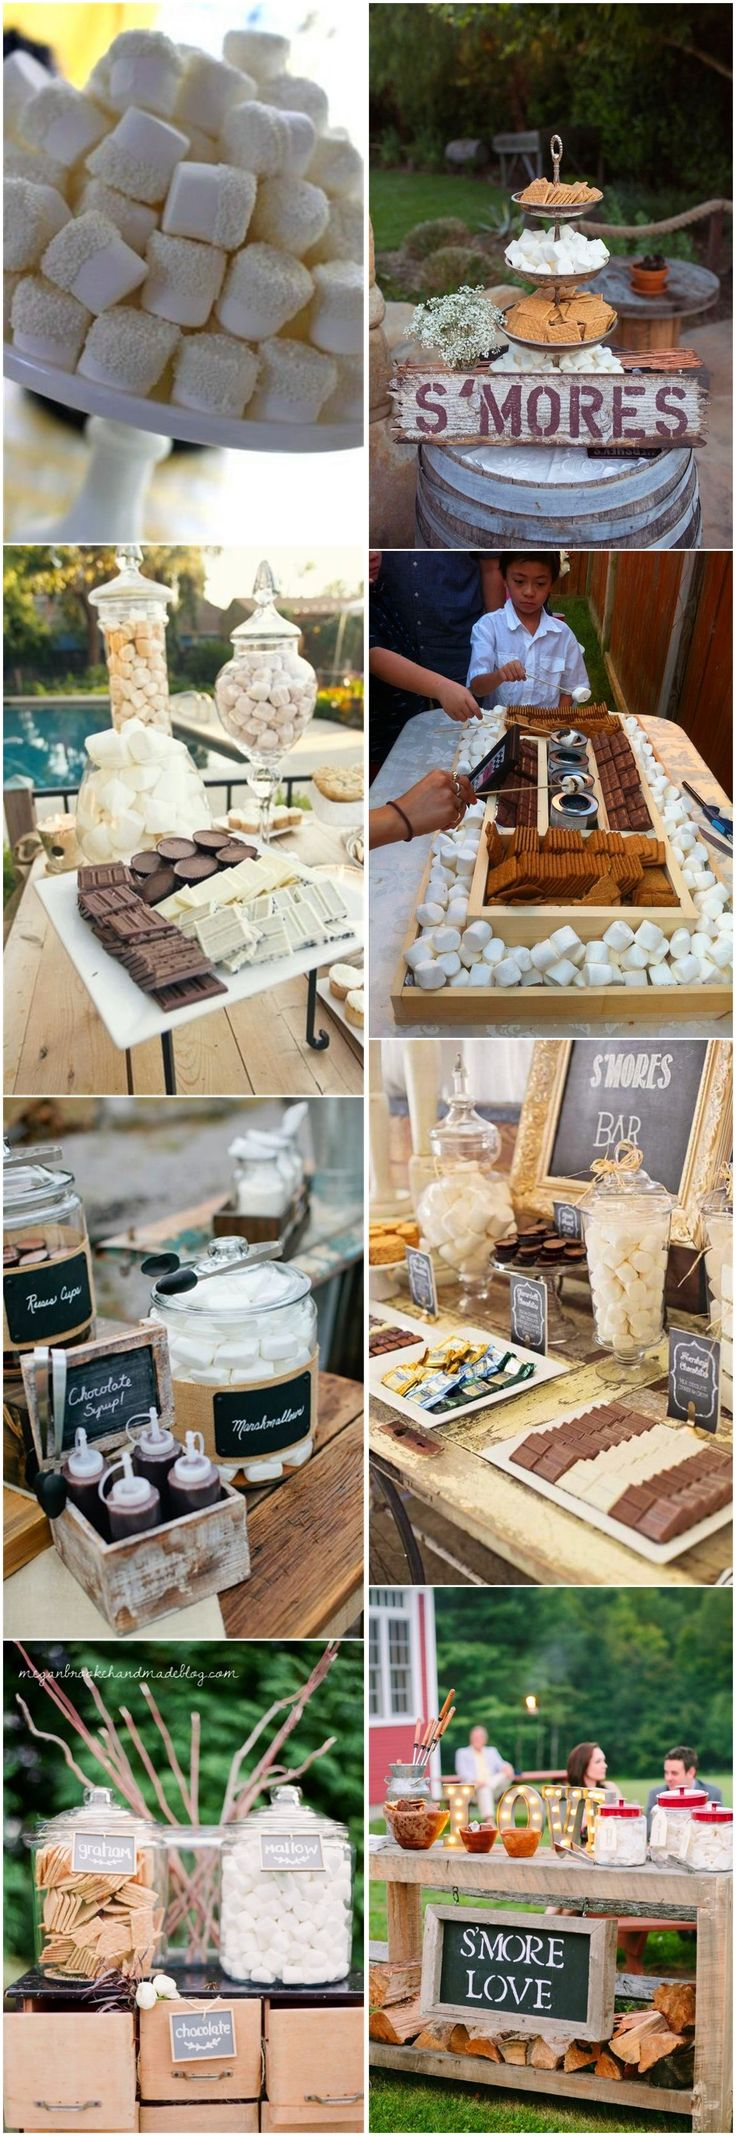 185 Best Wedding Dessert Bar Images On Pinterest Weddings